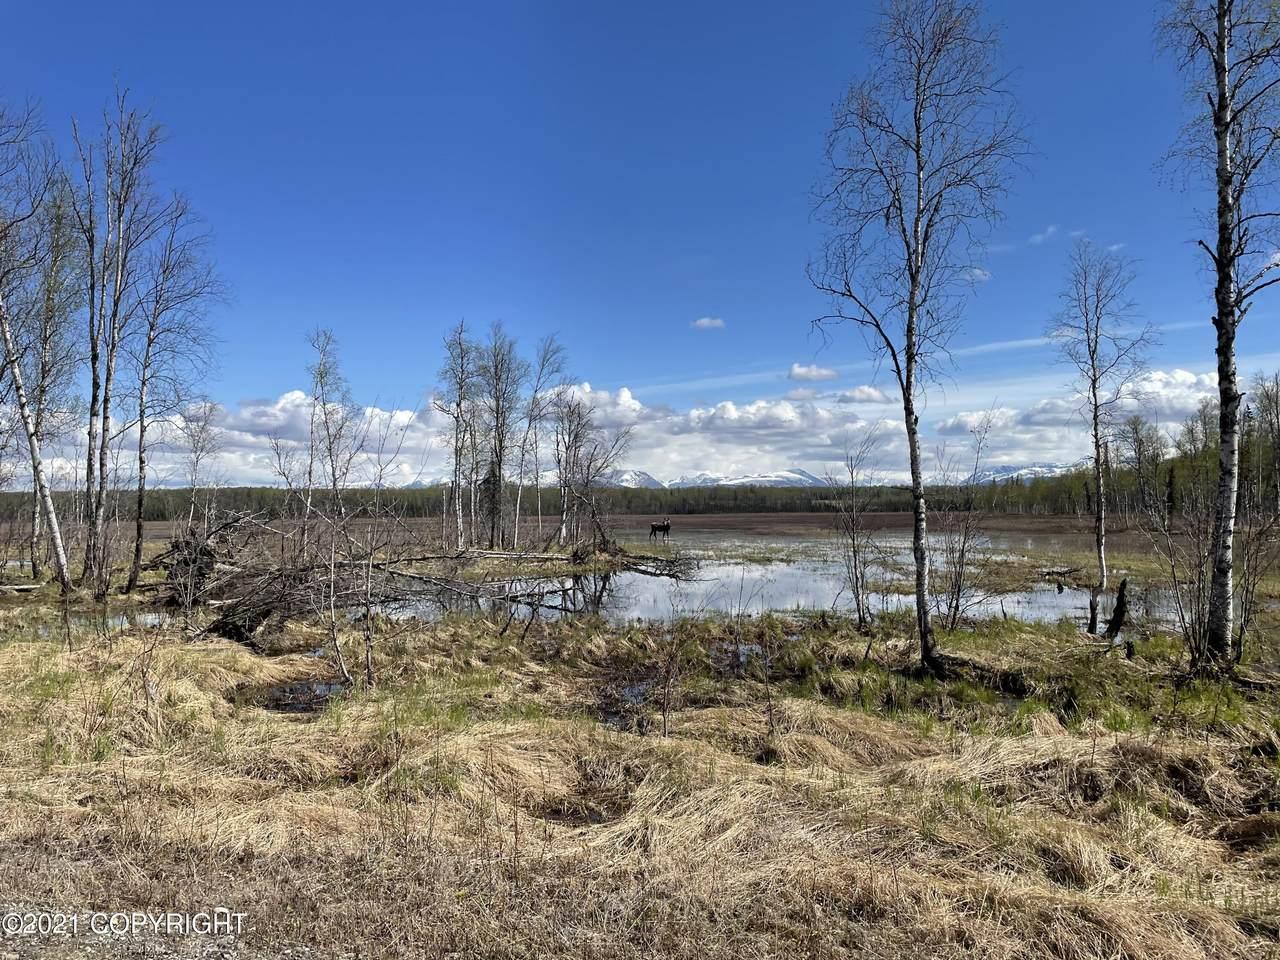 https://bt-photos.global.ssl.fastly.net/alaska/1280_boomver_3_21-1857-2.jpg